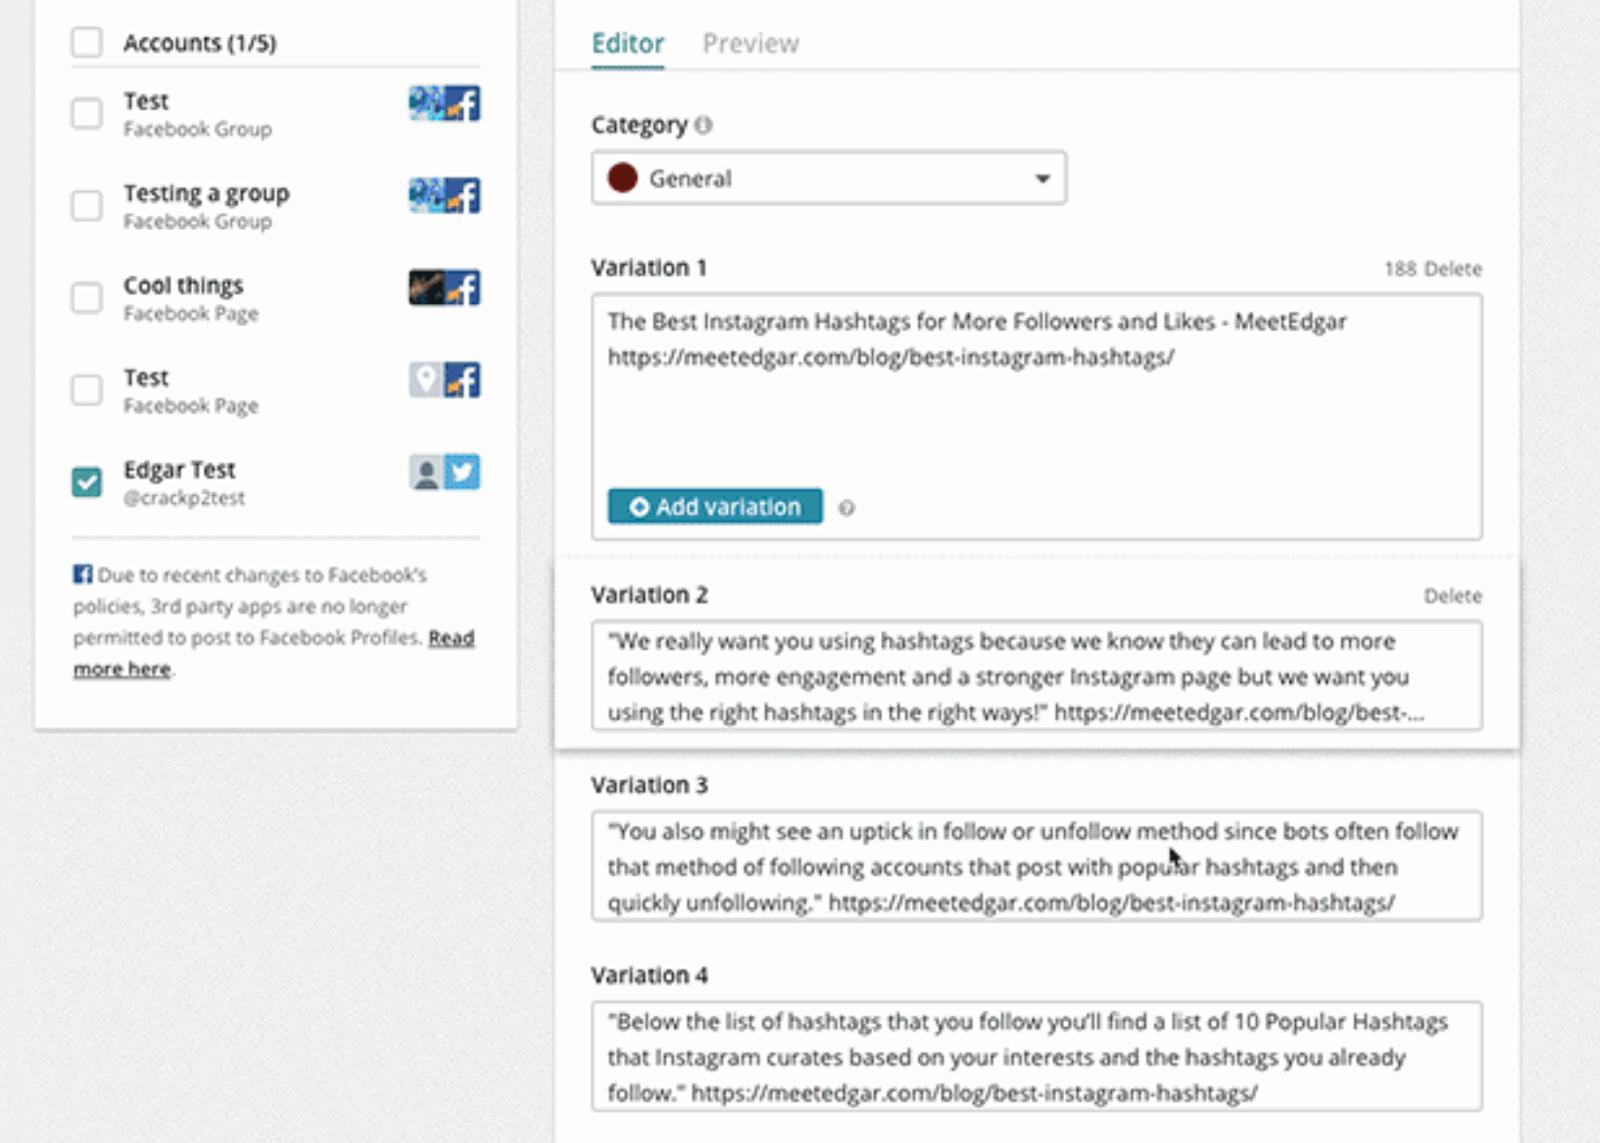 repurpose content with meetedgar